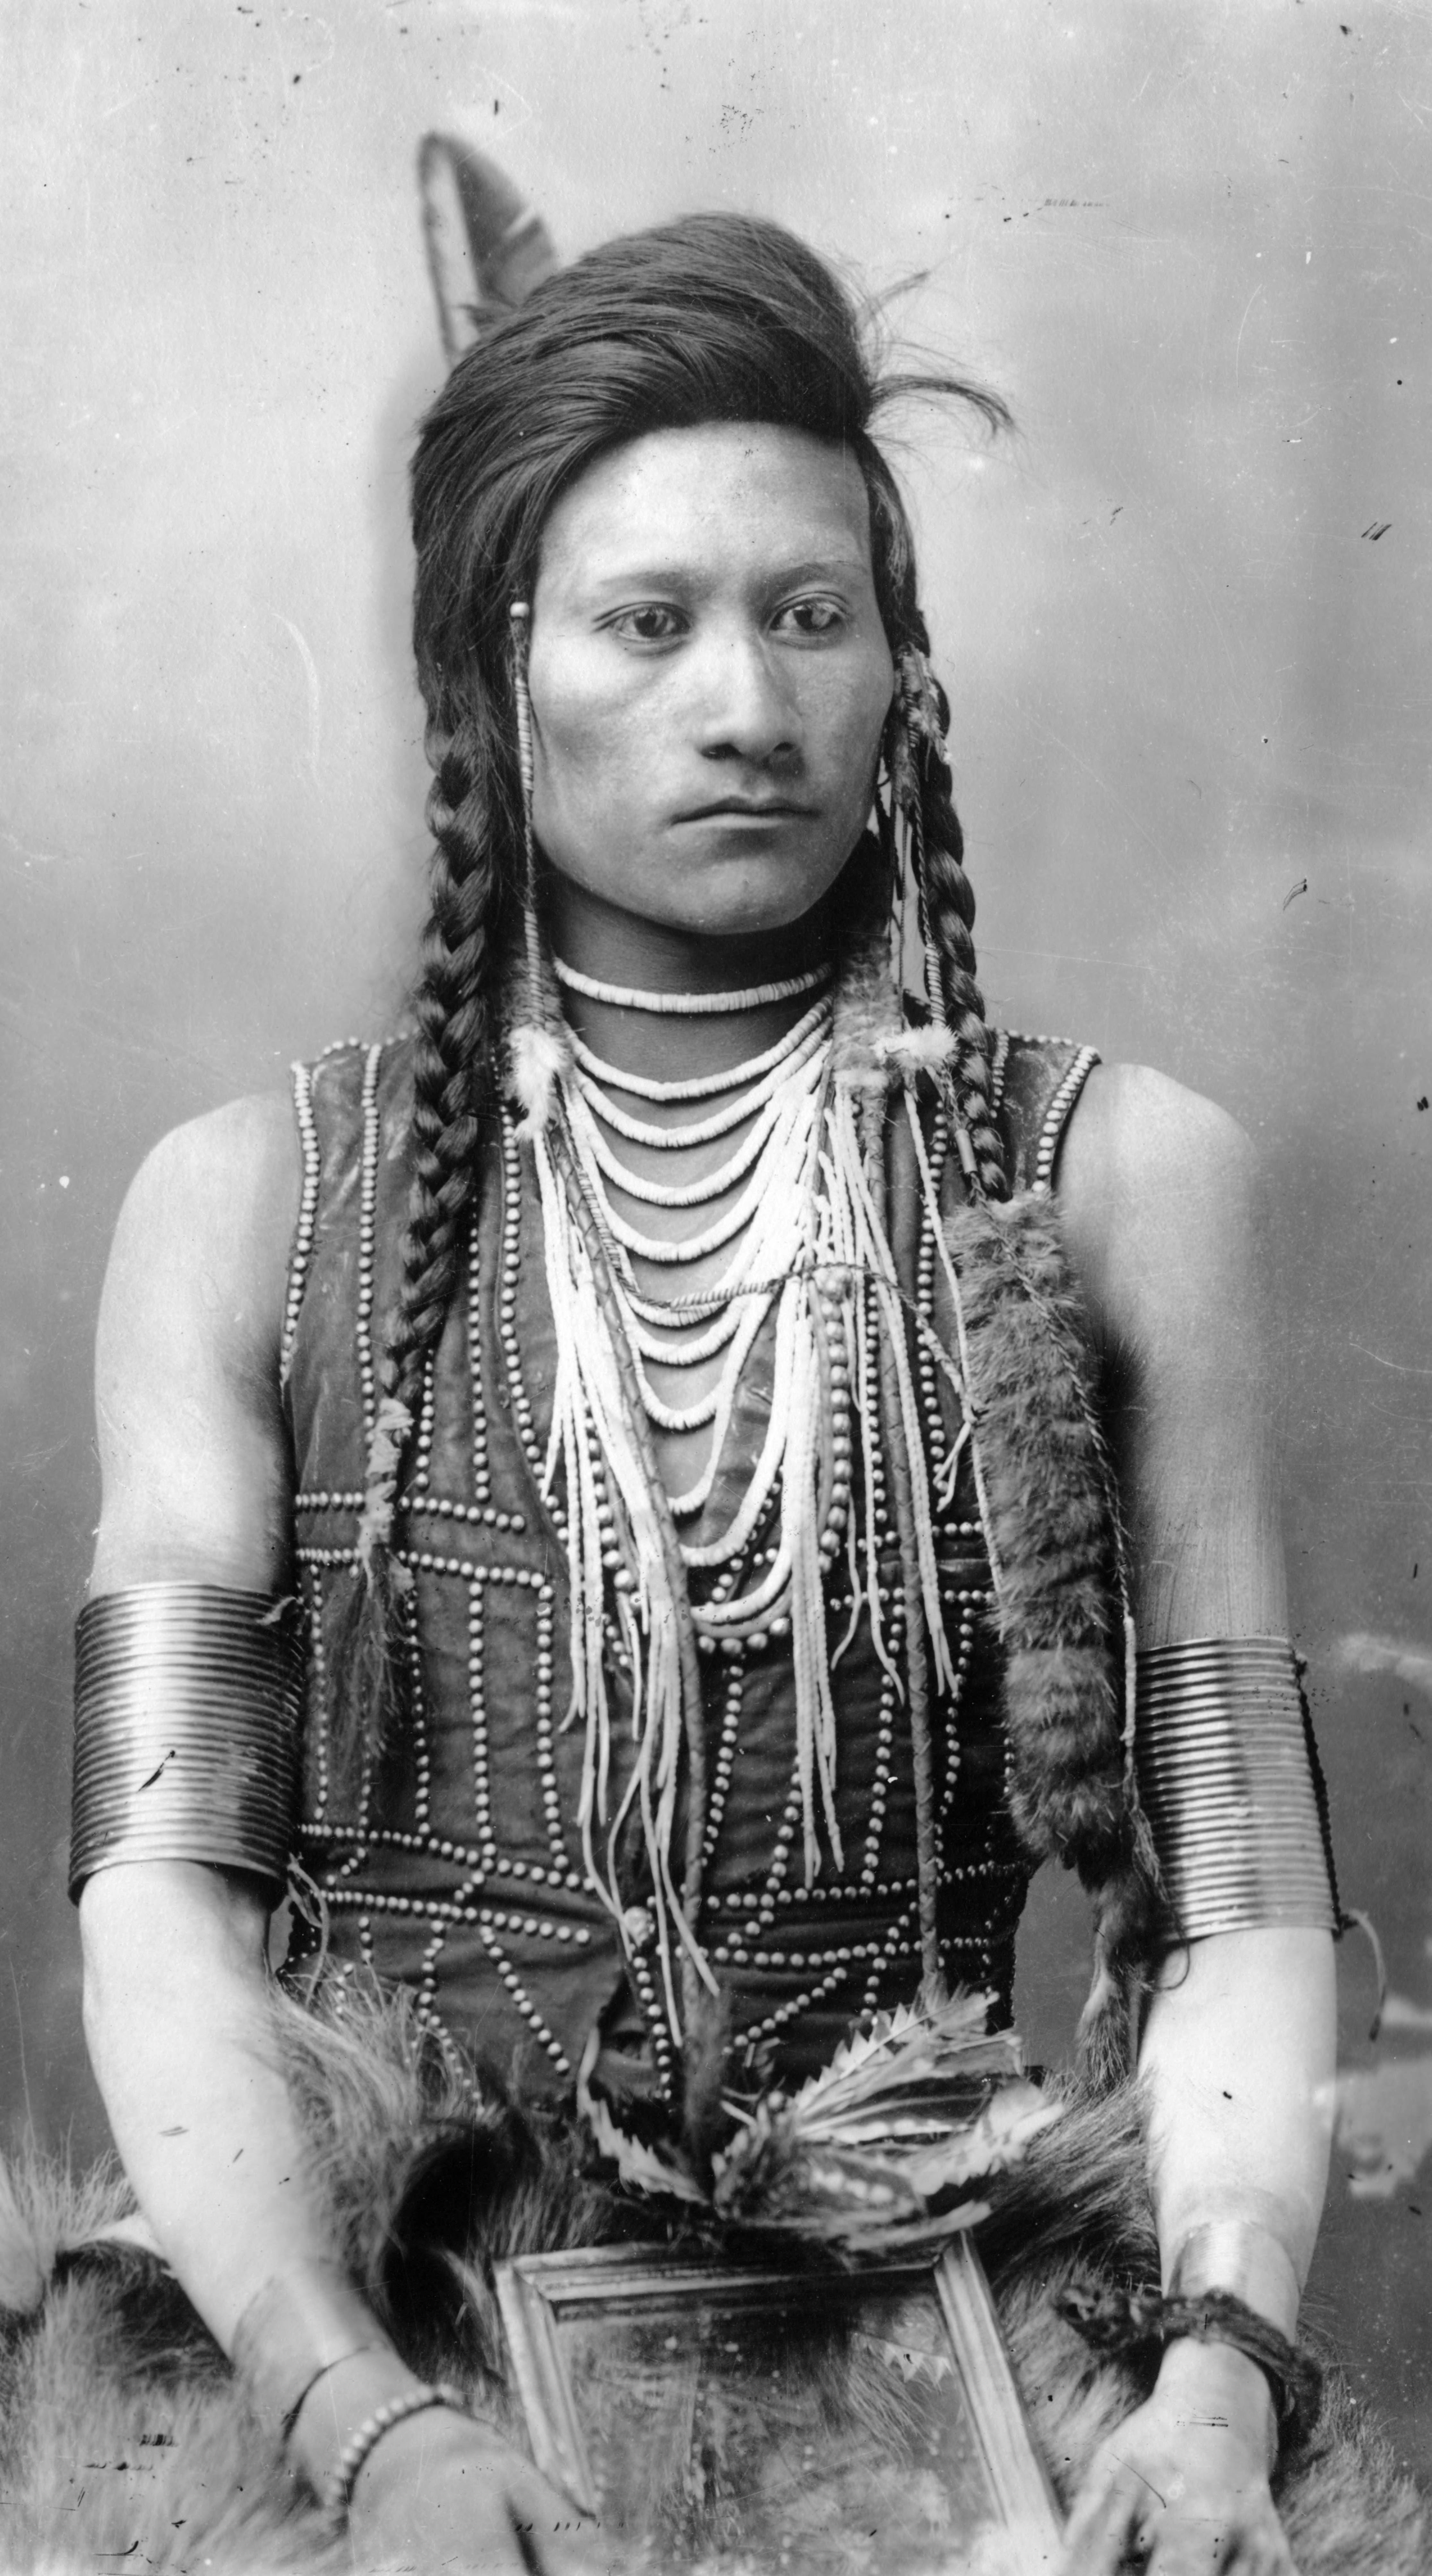 Codsiogo a Native American Shoshone man